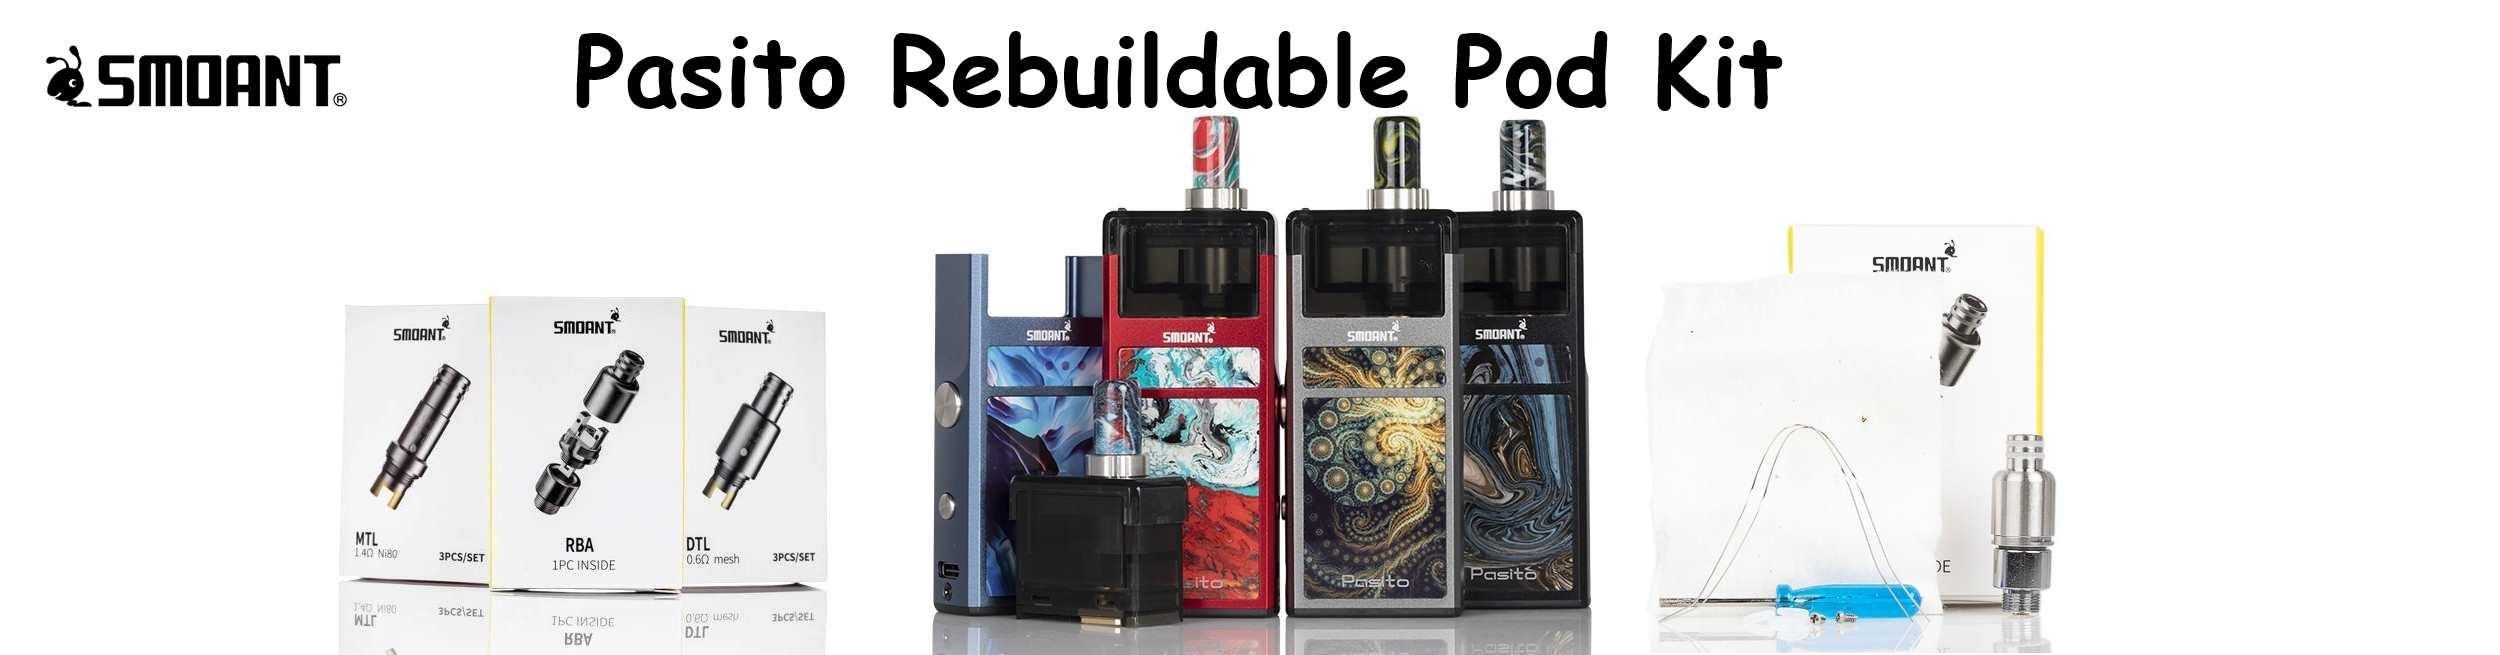 Smoant Pasito Rebuildable Pod Kit